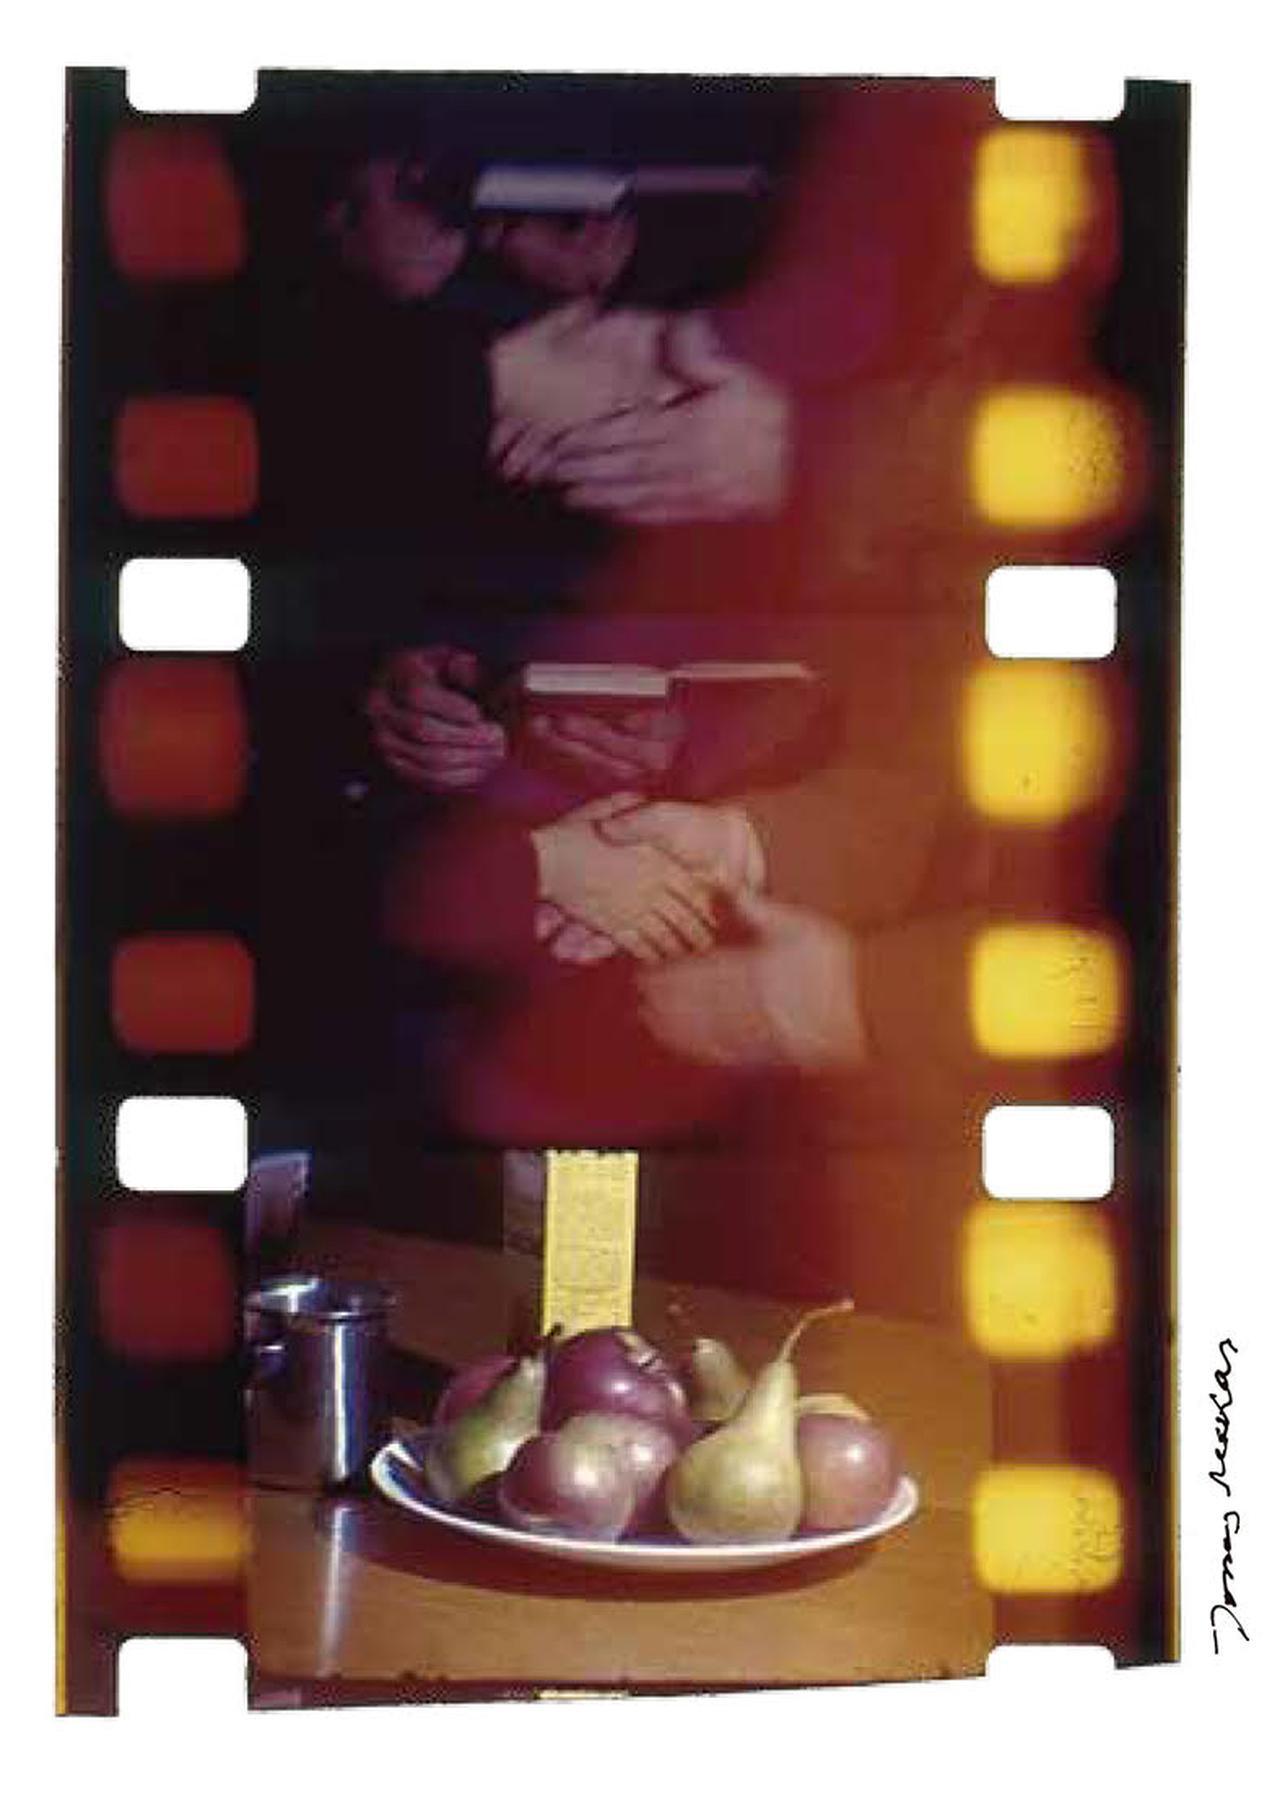 Images : ジョナス・メカス写真展『Frozen Film Frames』|スタジオ35分